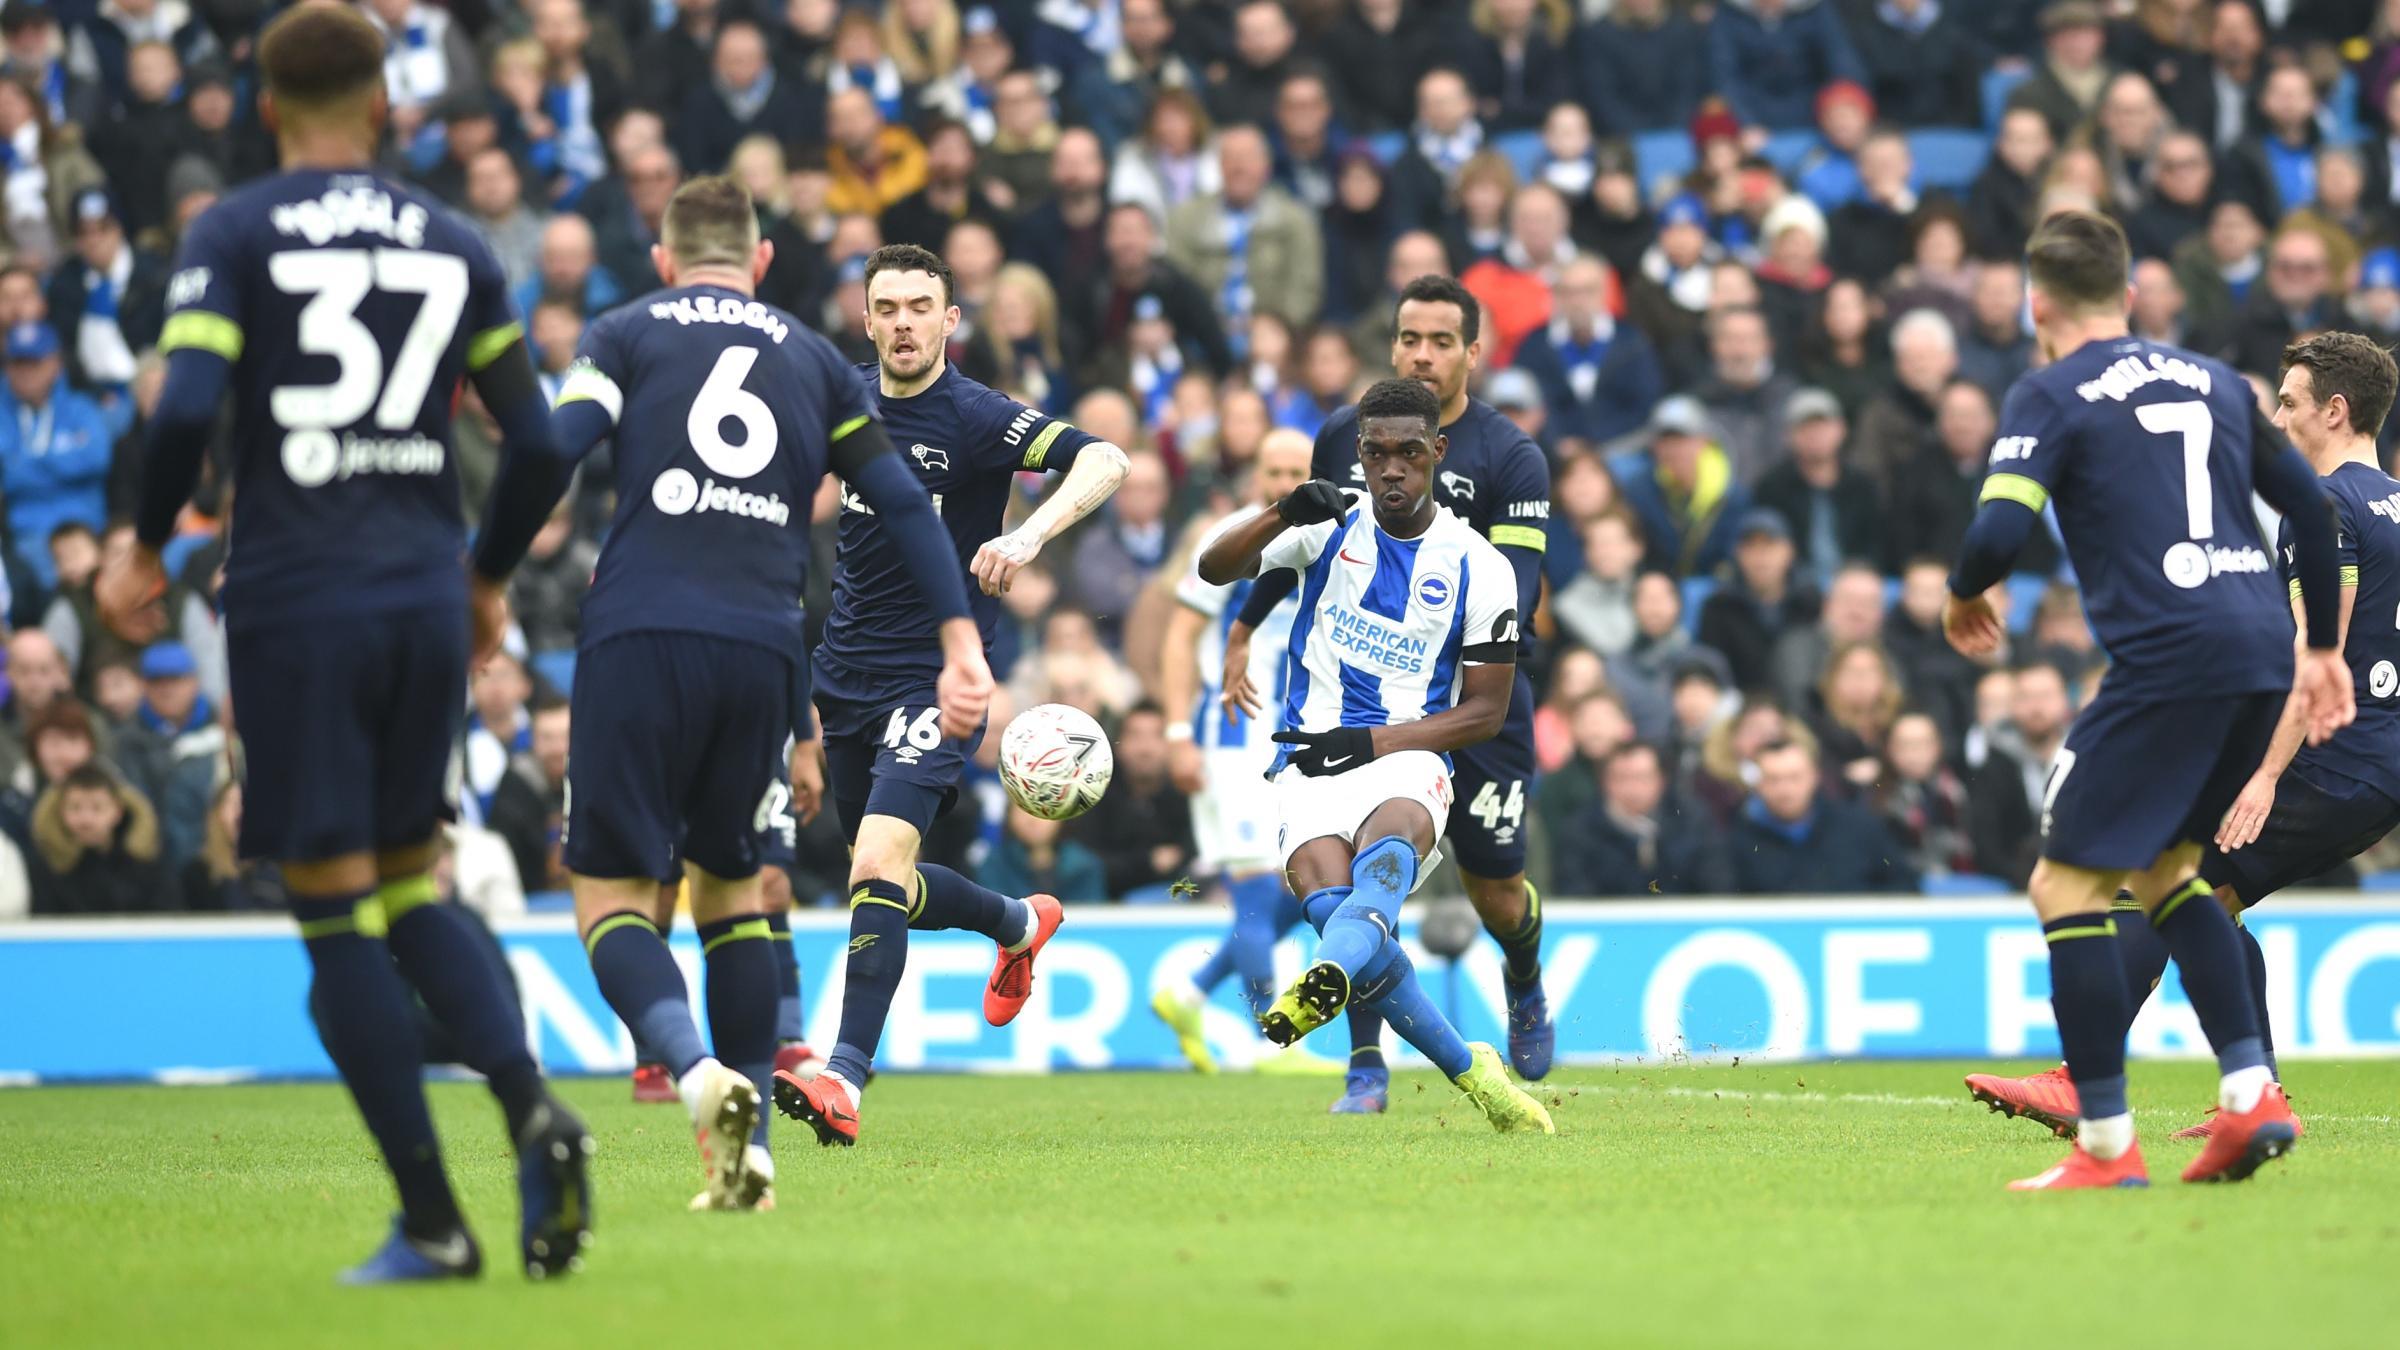 Albion Analysis: Bissouma stakes a claim